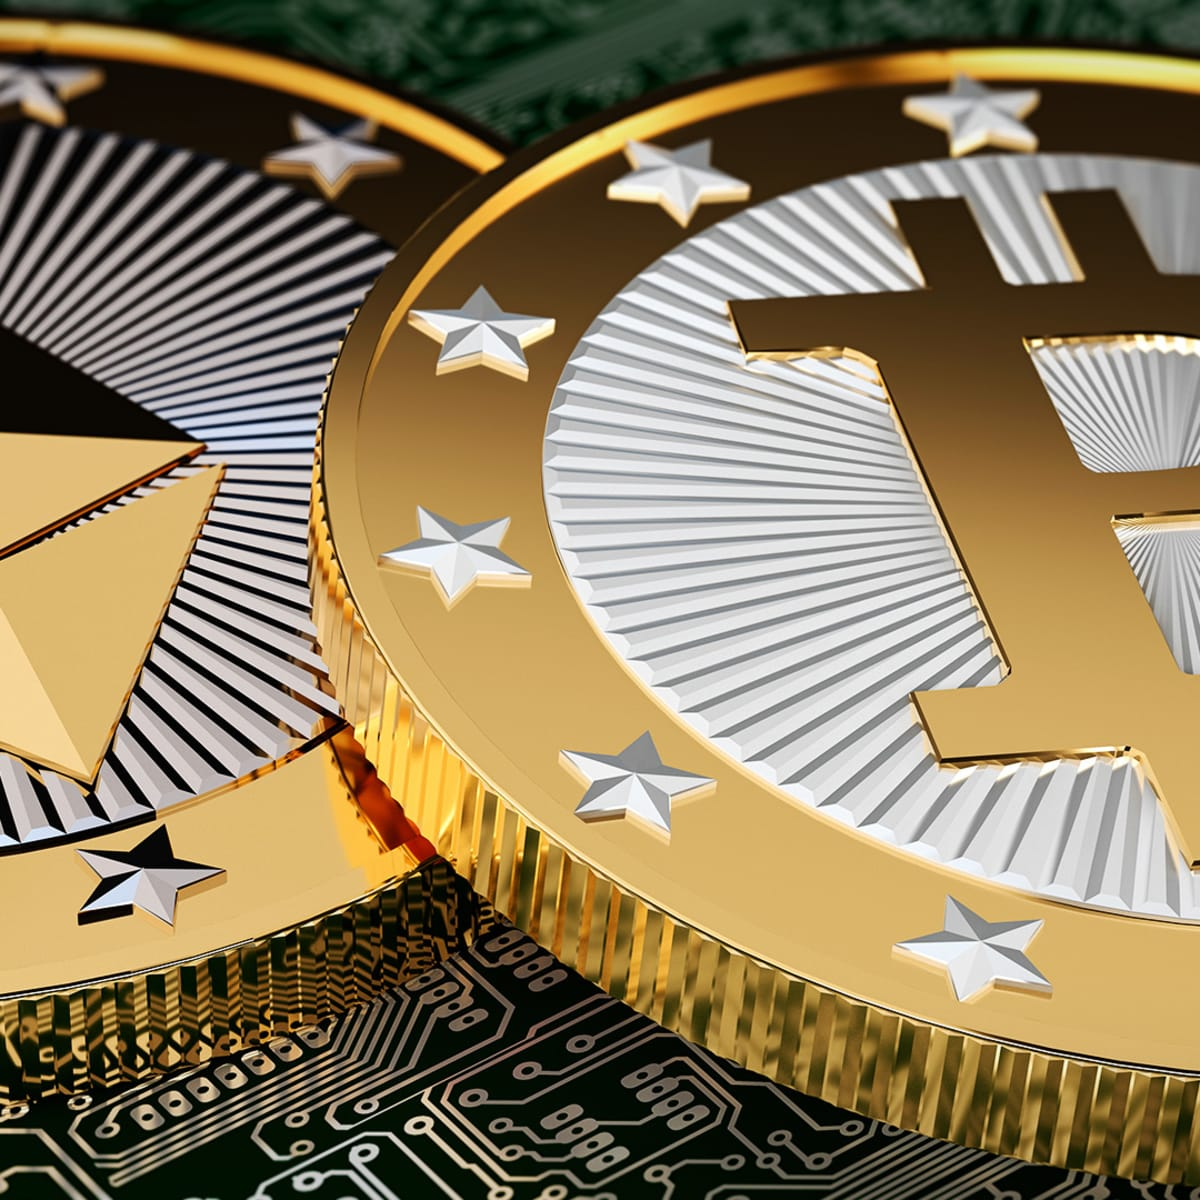 cfd vs warrants investind în etherium vs bitcoin